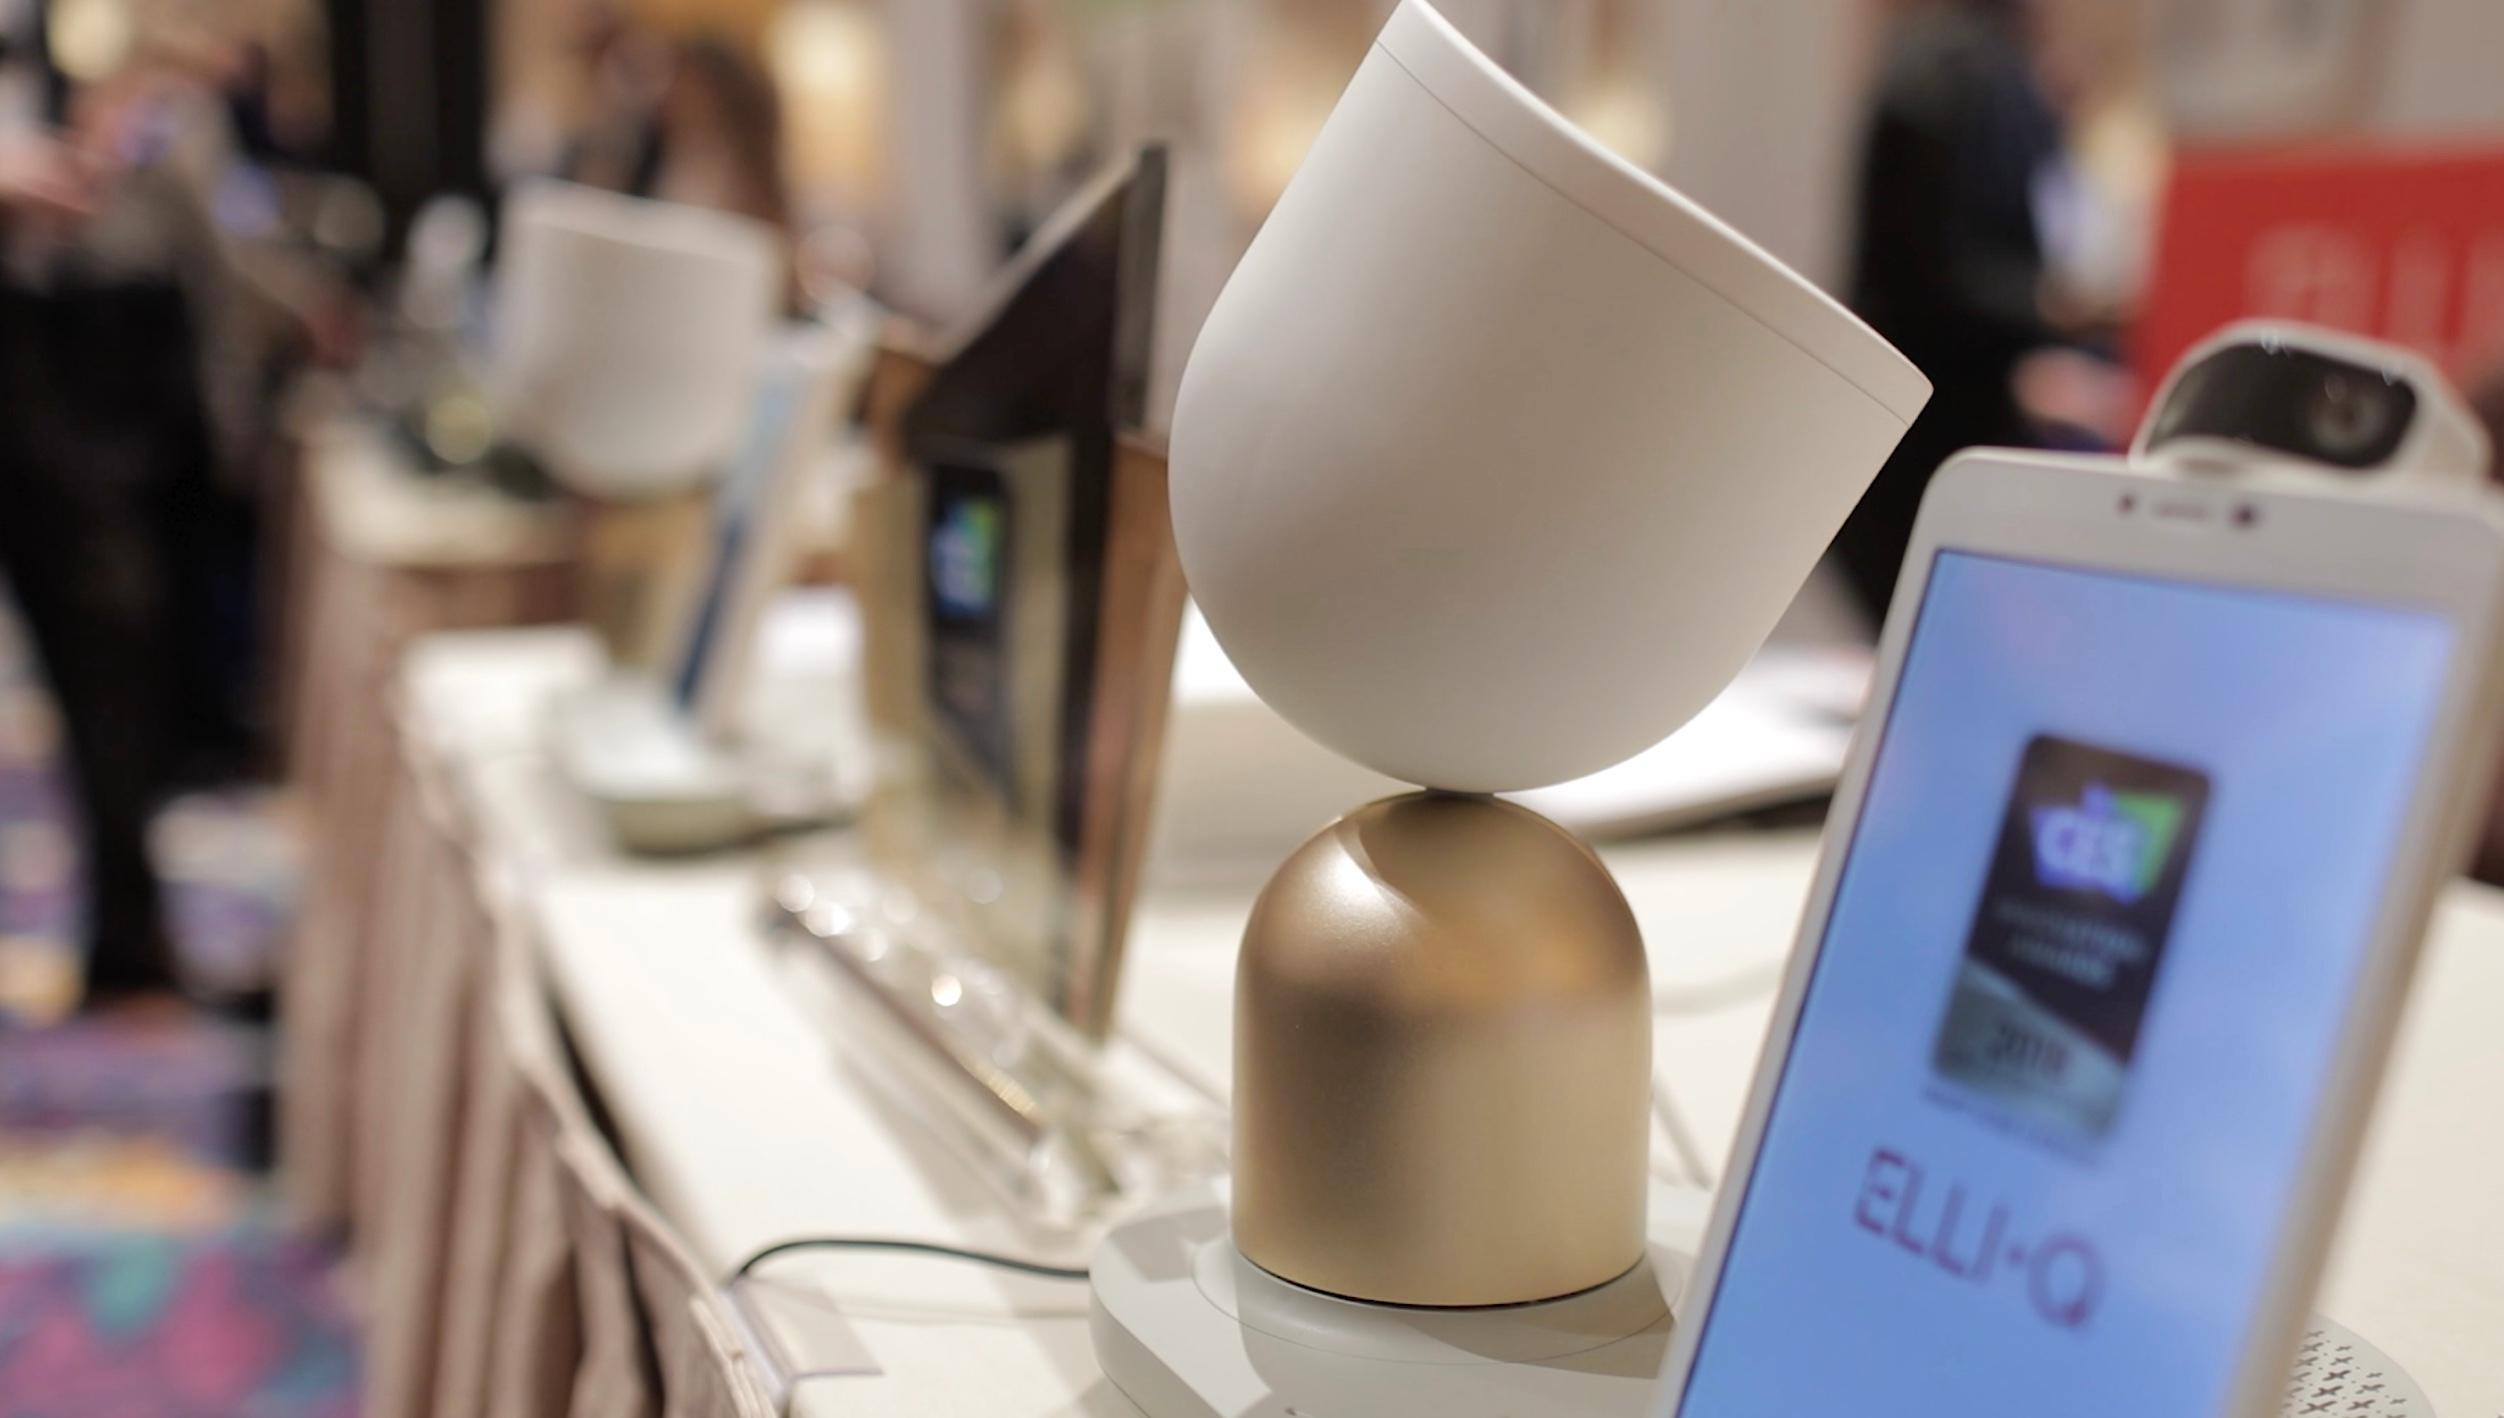 ElliQ begins beta testing its companion robot for older adults